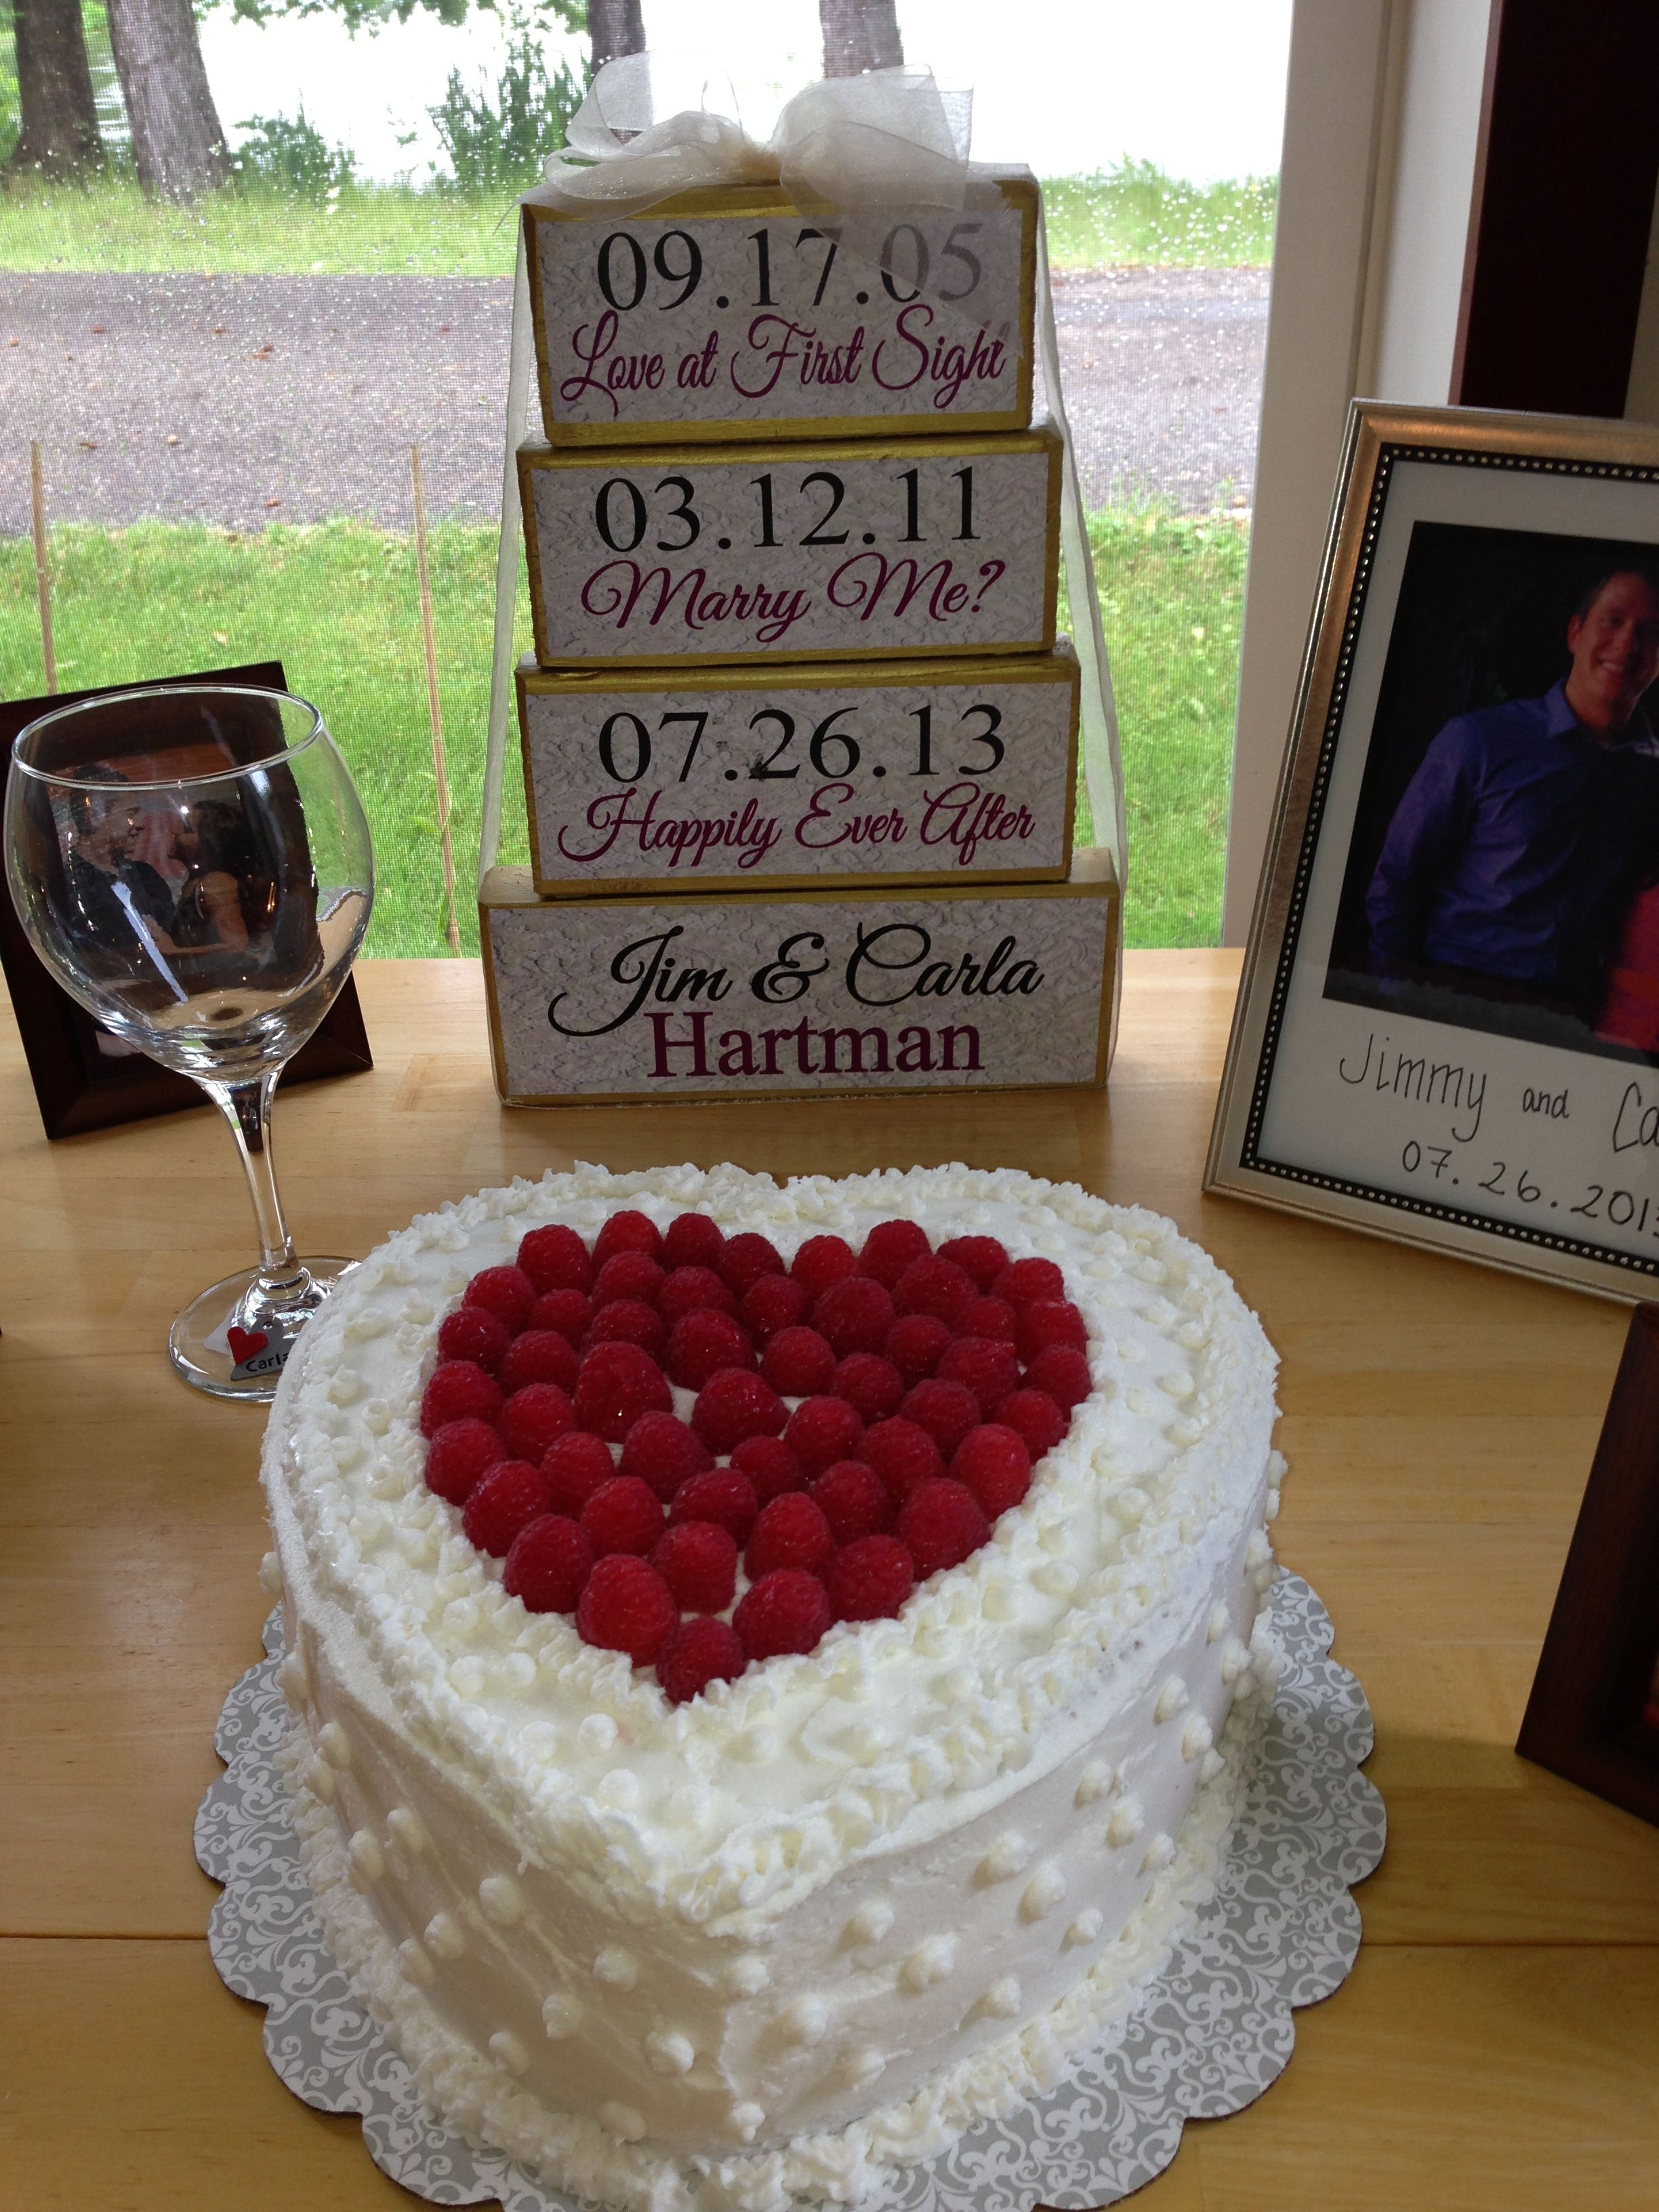 Bridal shower decorations and cake Bridal shower food